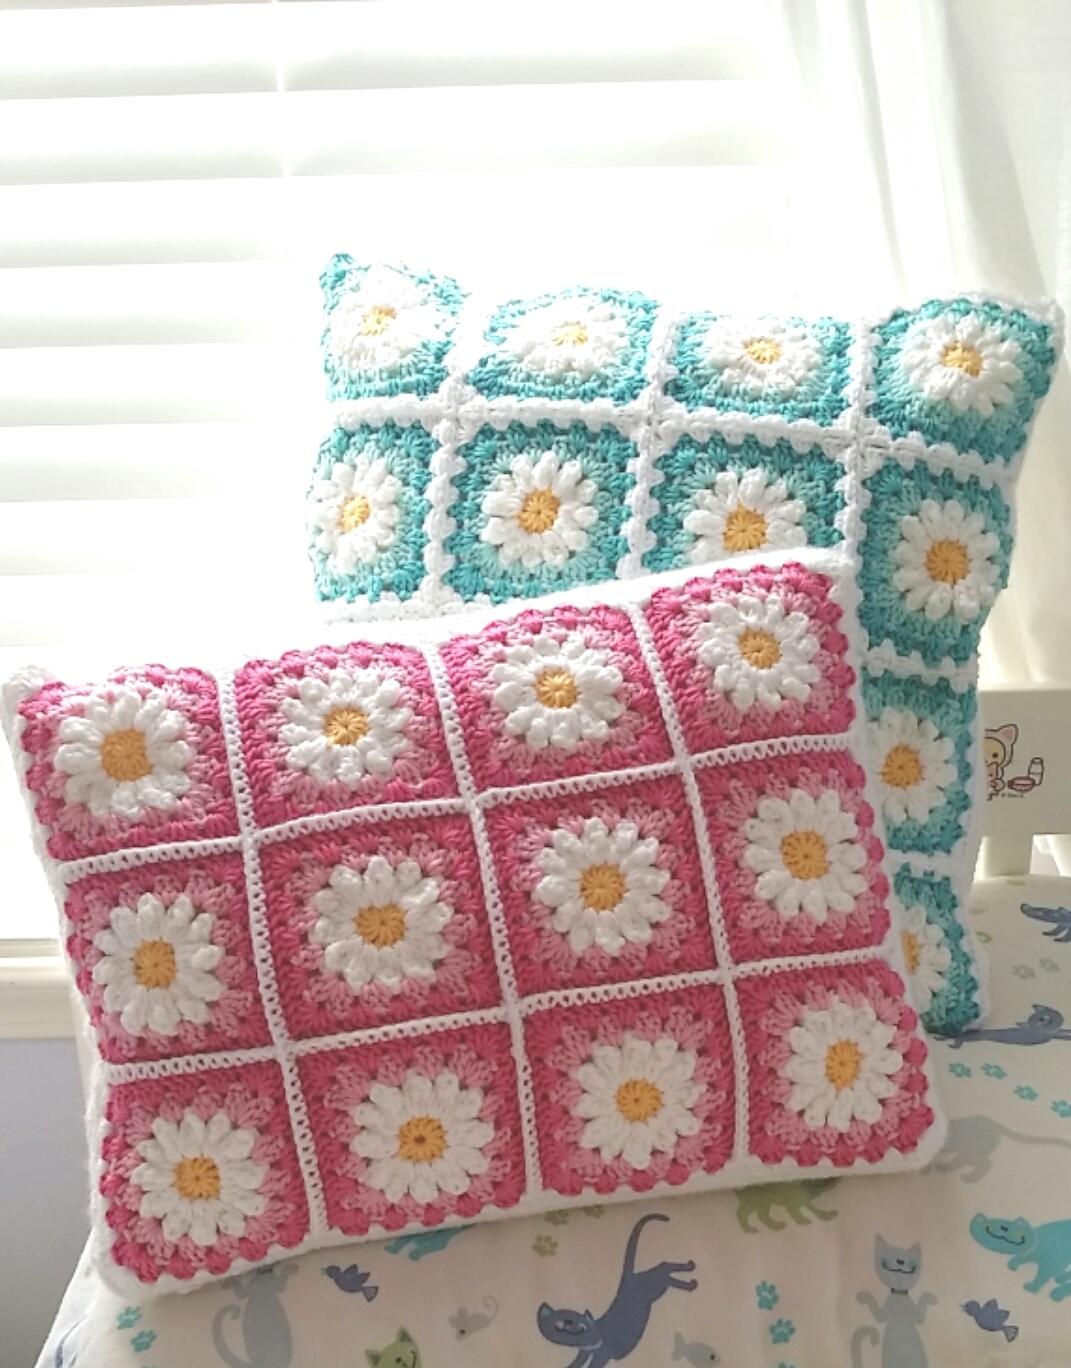 Agnes Gurumi: Daisy Granny Square Cushion Pillow